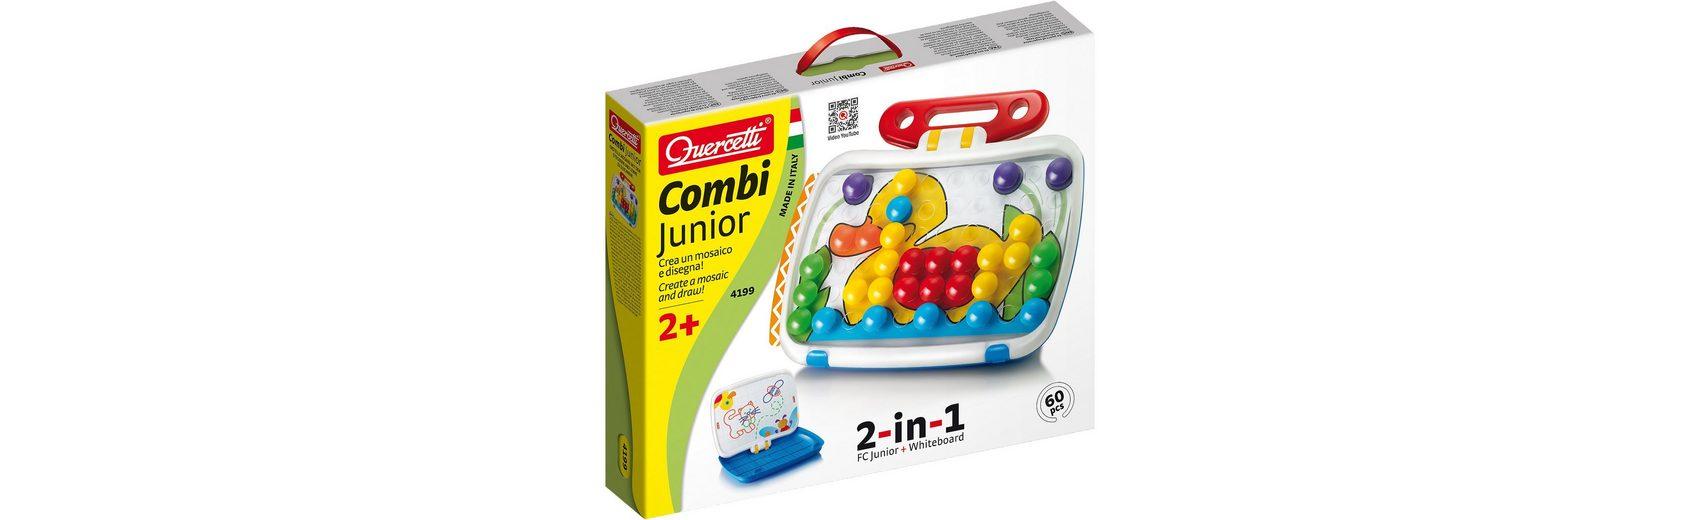 Quercetti Fantacolor Combi Junior